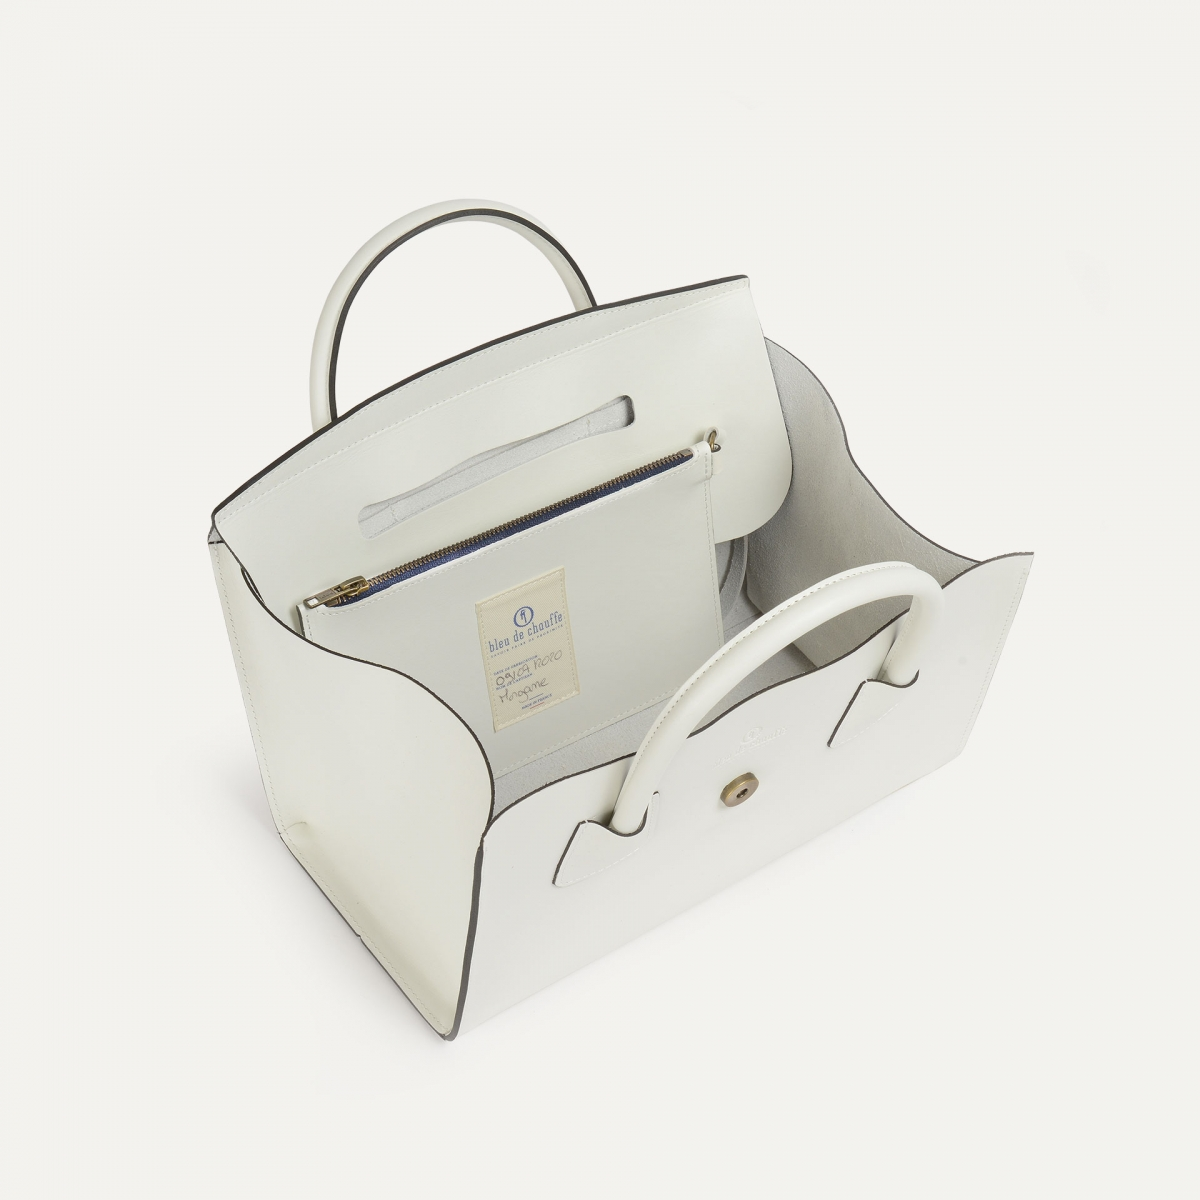 Cabas Origami M - Blanc (image n°3)